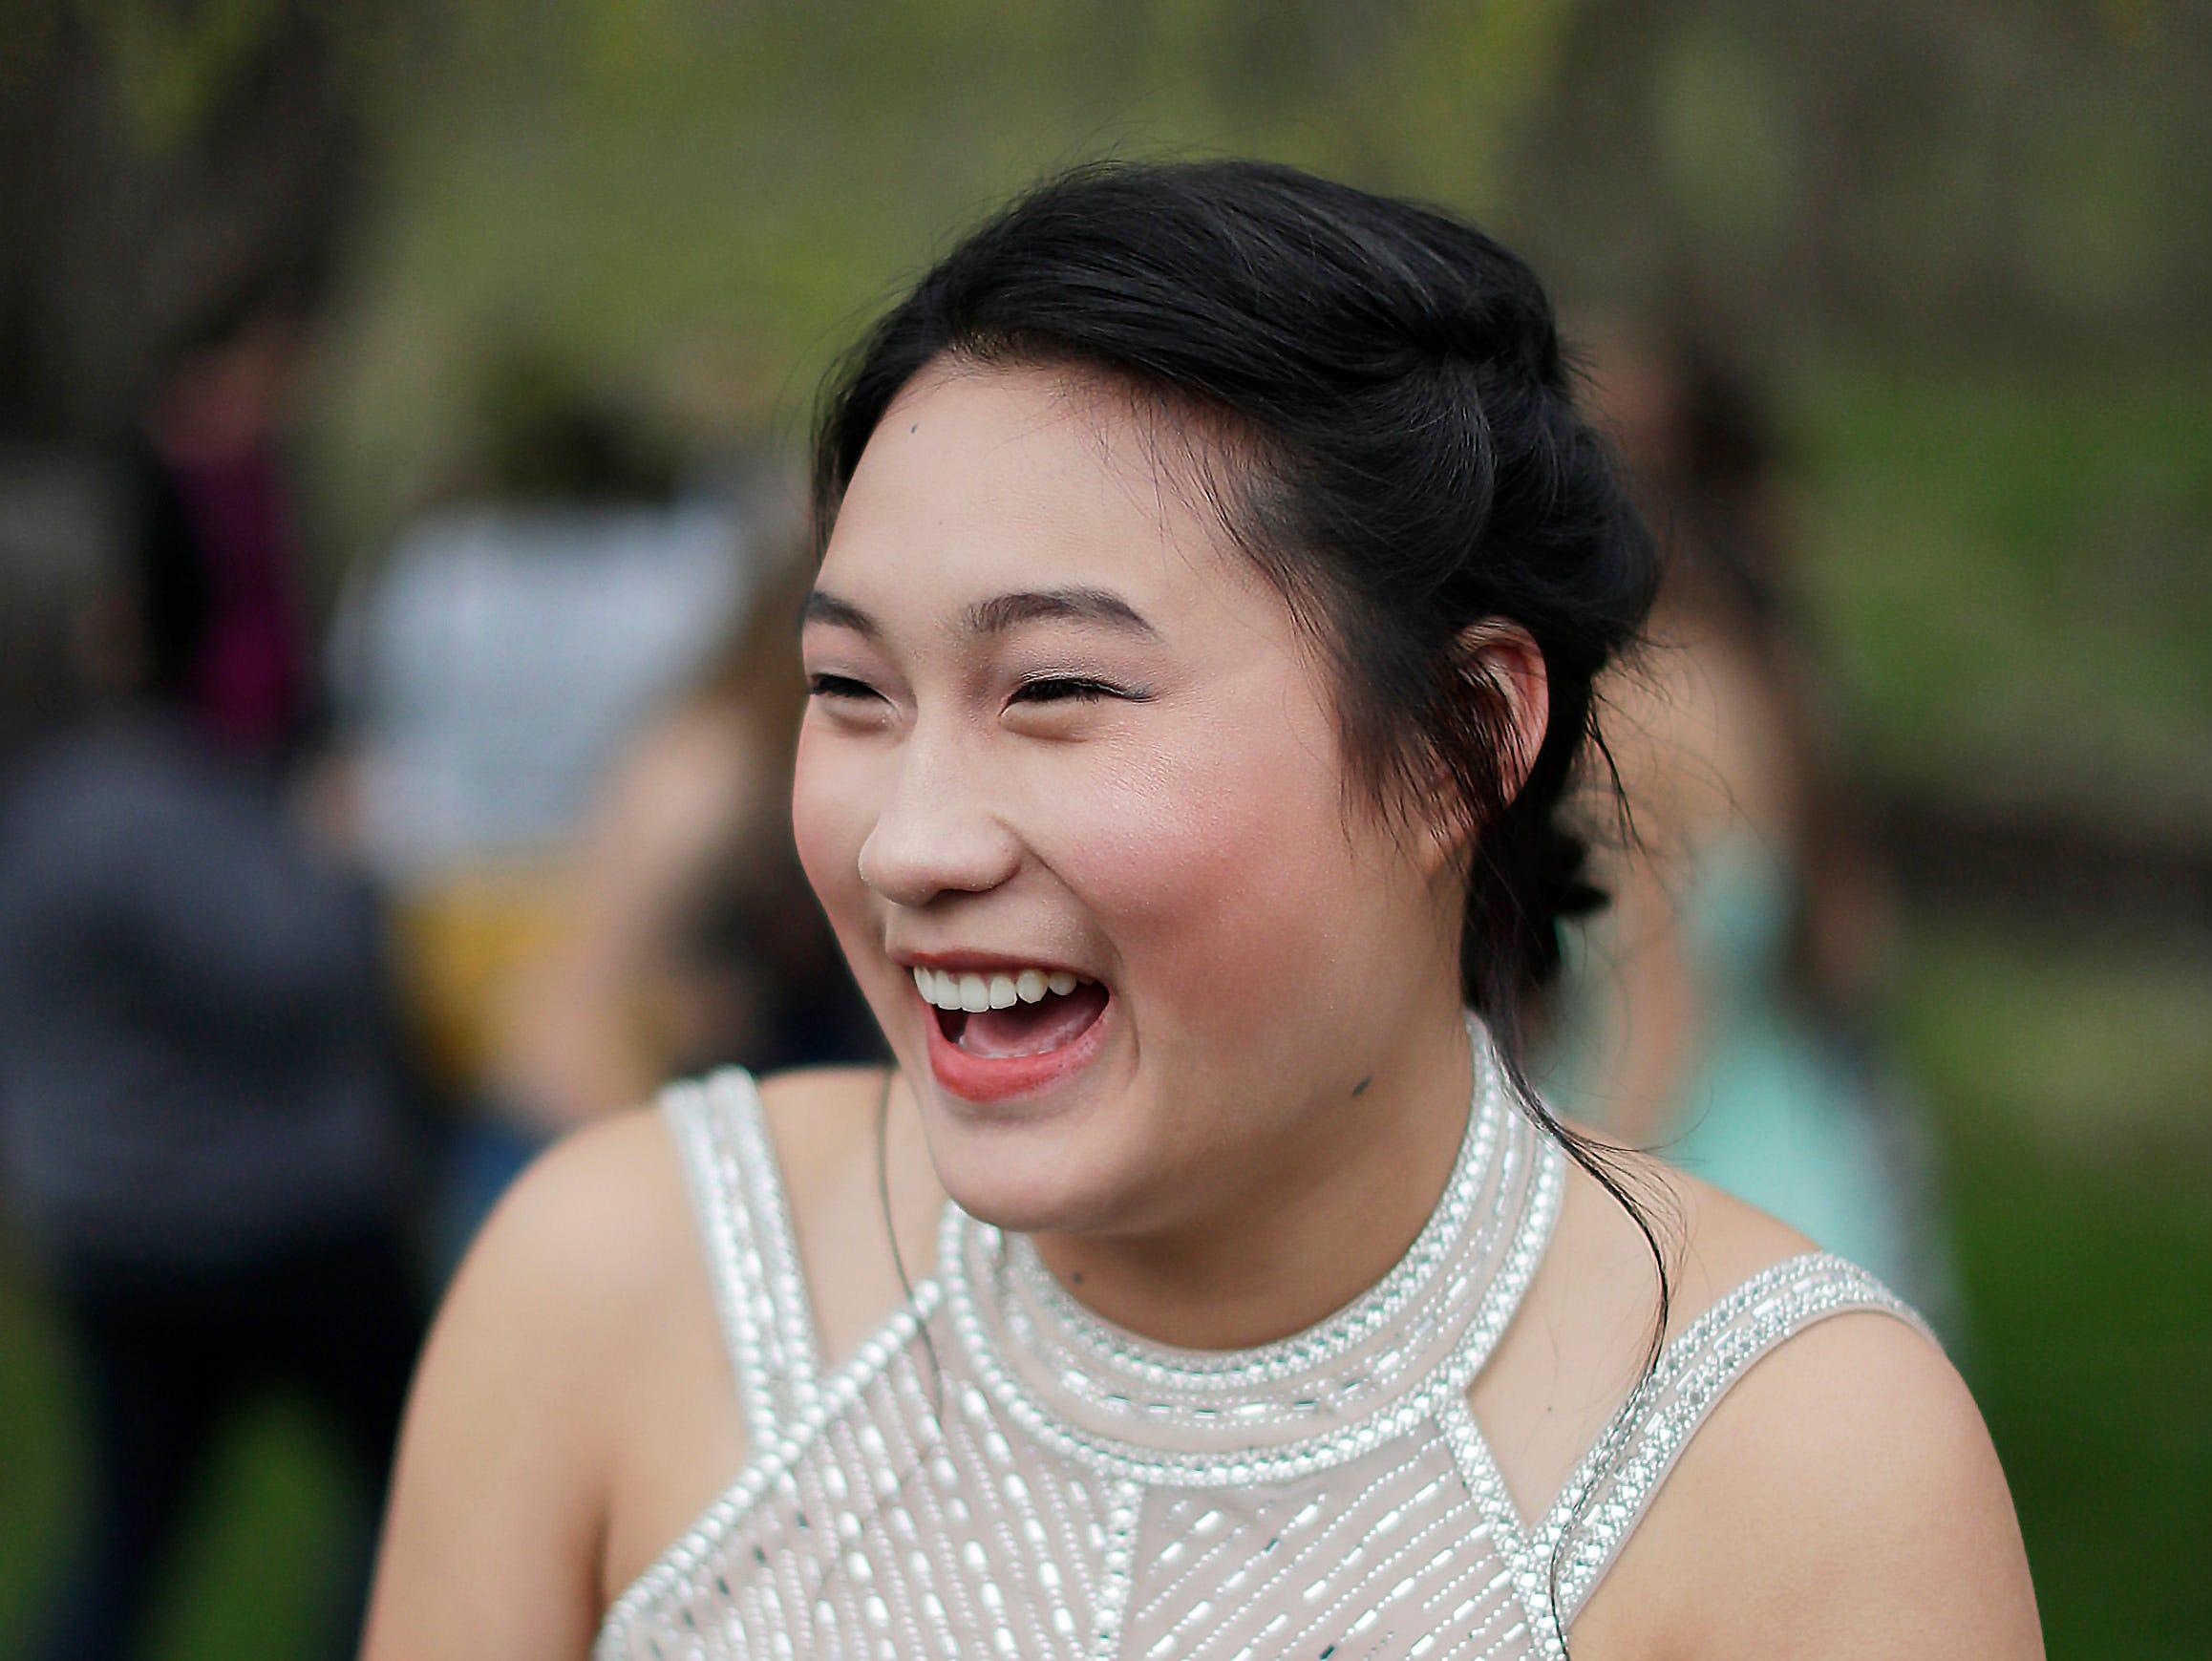 Thailand foreign exchange student Tulip Khandeeramongkol smiles during the Sheboygan Christian Junior-Senior Banquet, Friday, May 3, 2019, at The Blind Horse, in Kohler, Wis.